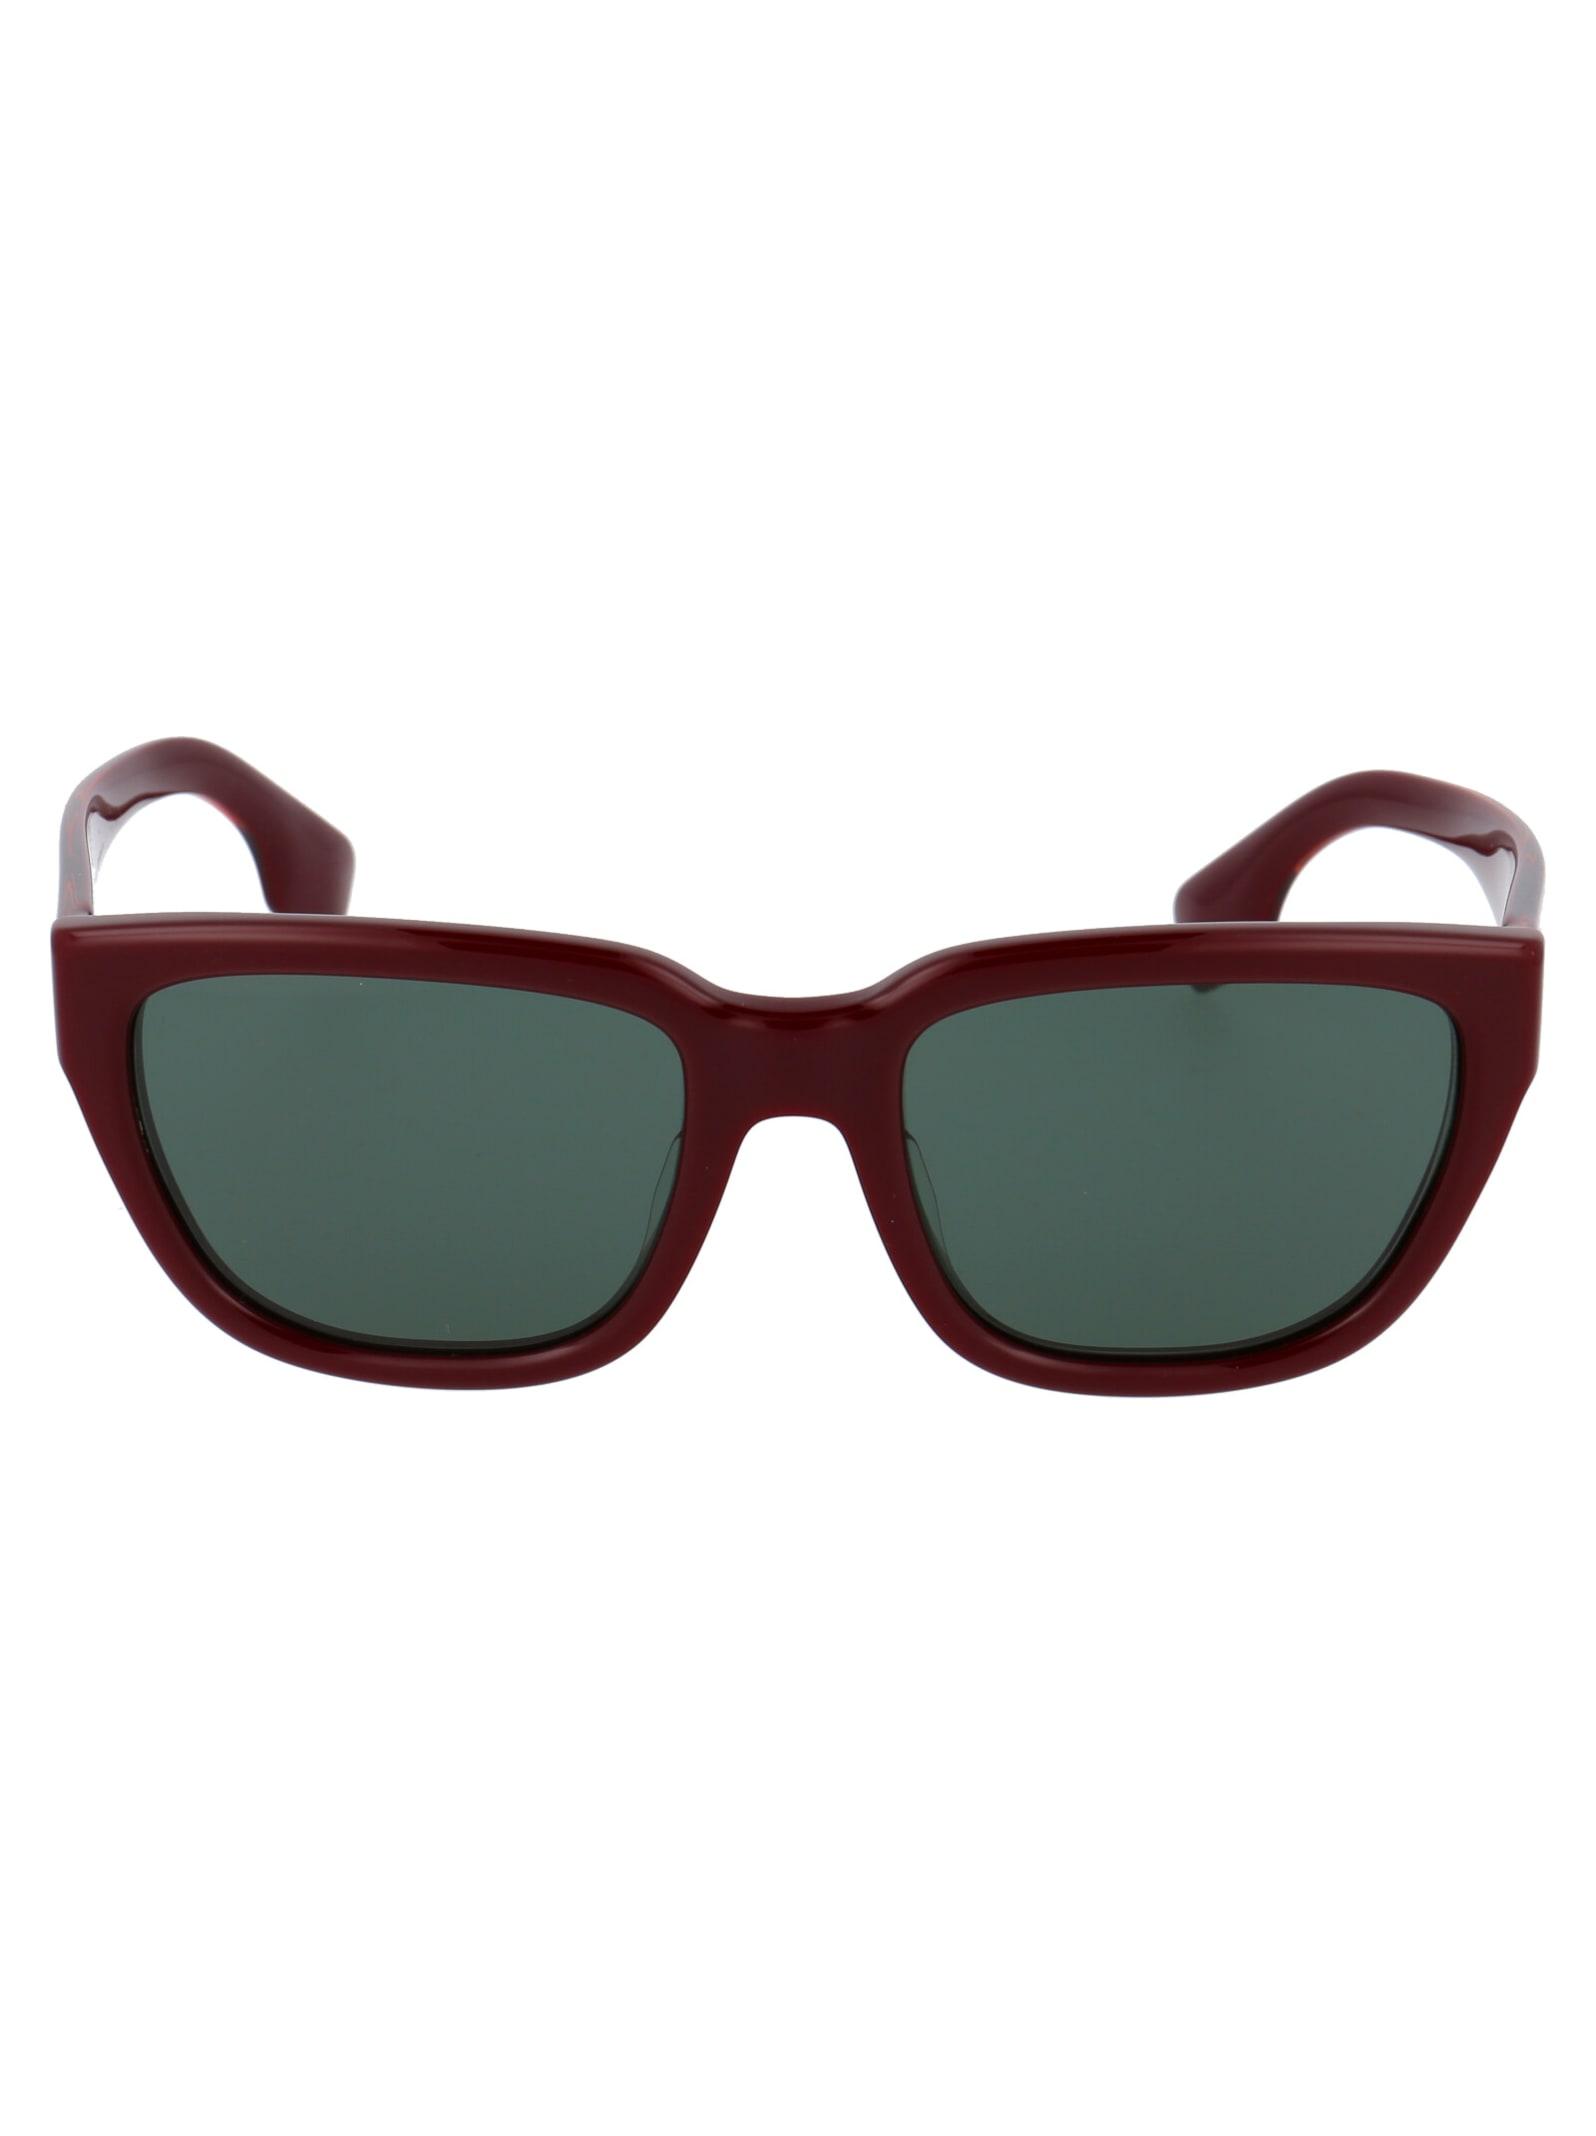 0be4277 Sunglasses